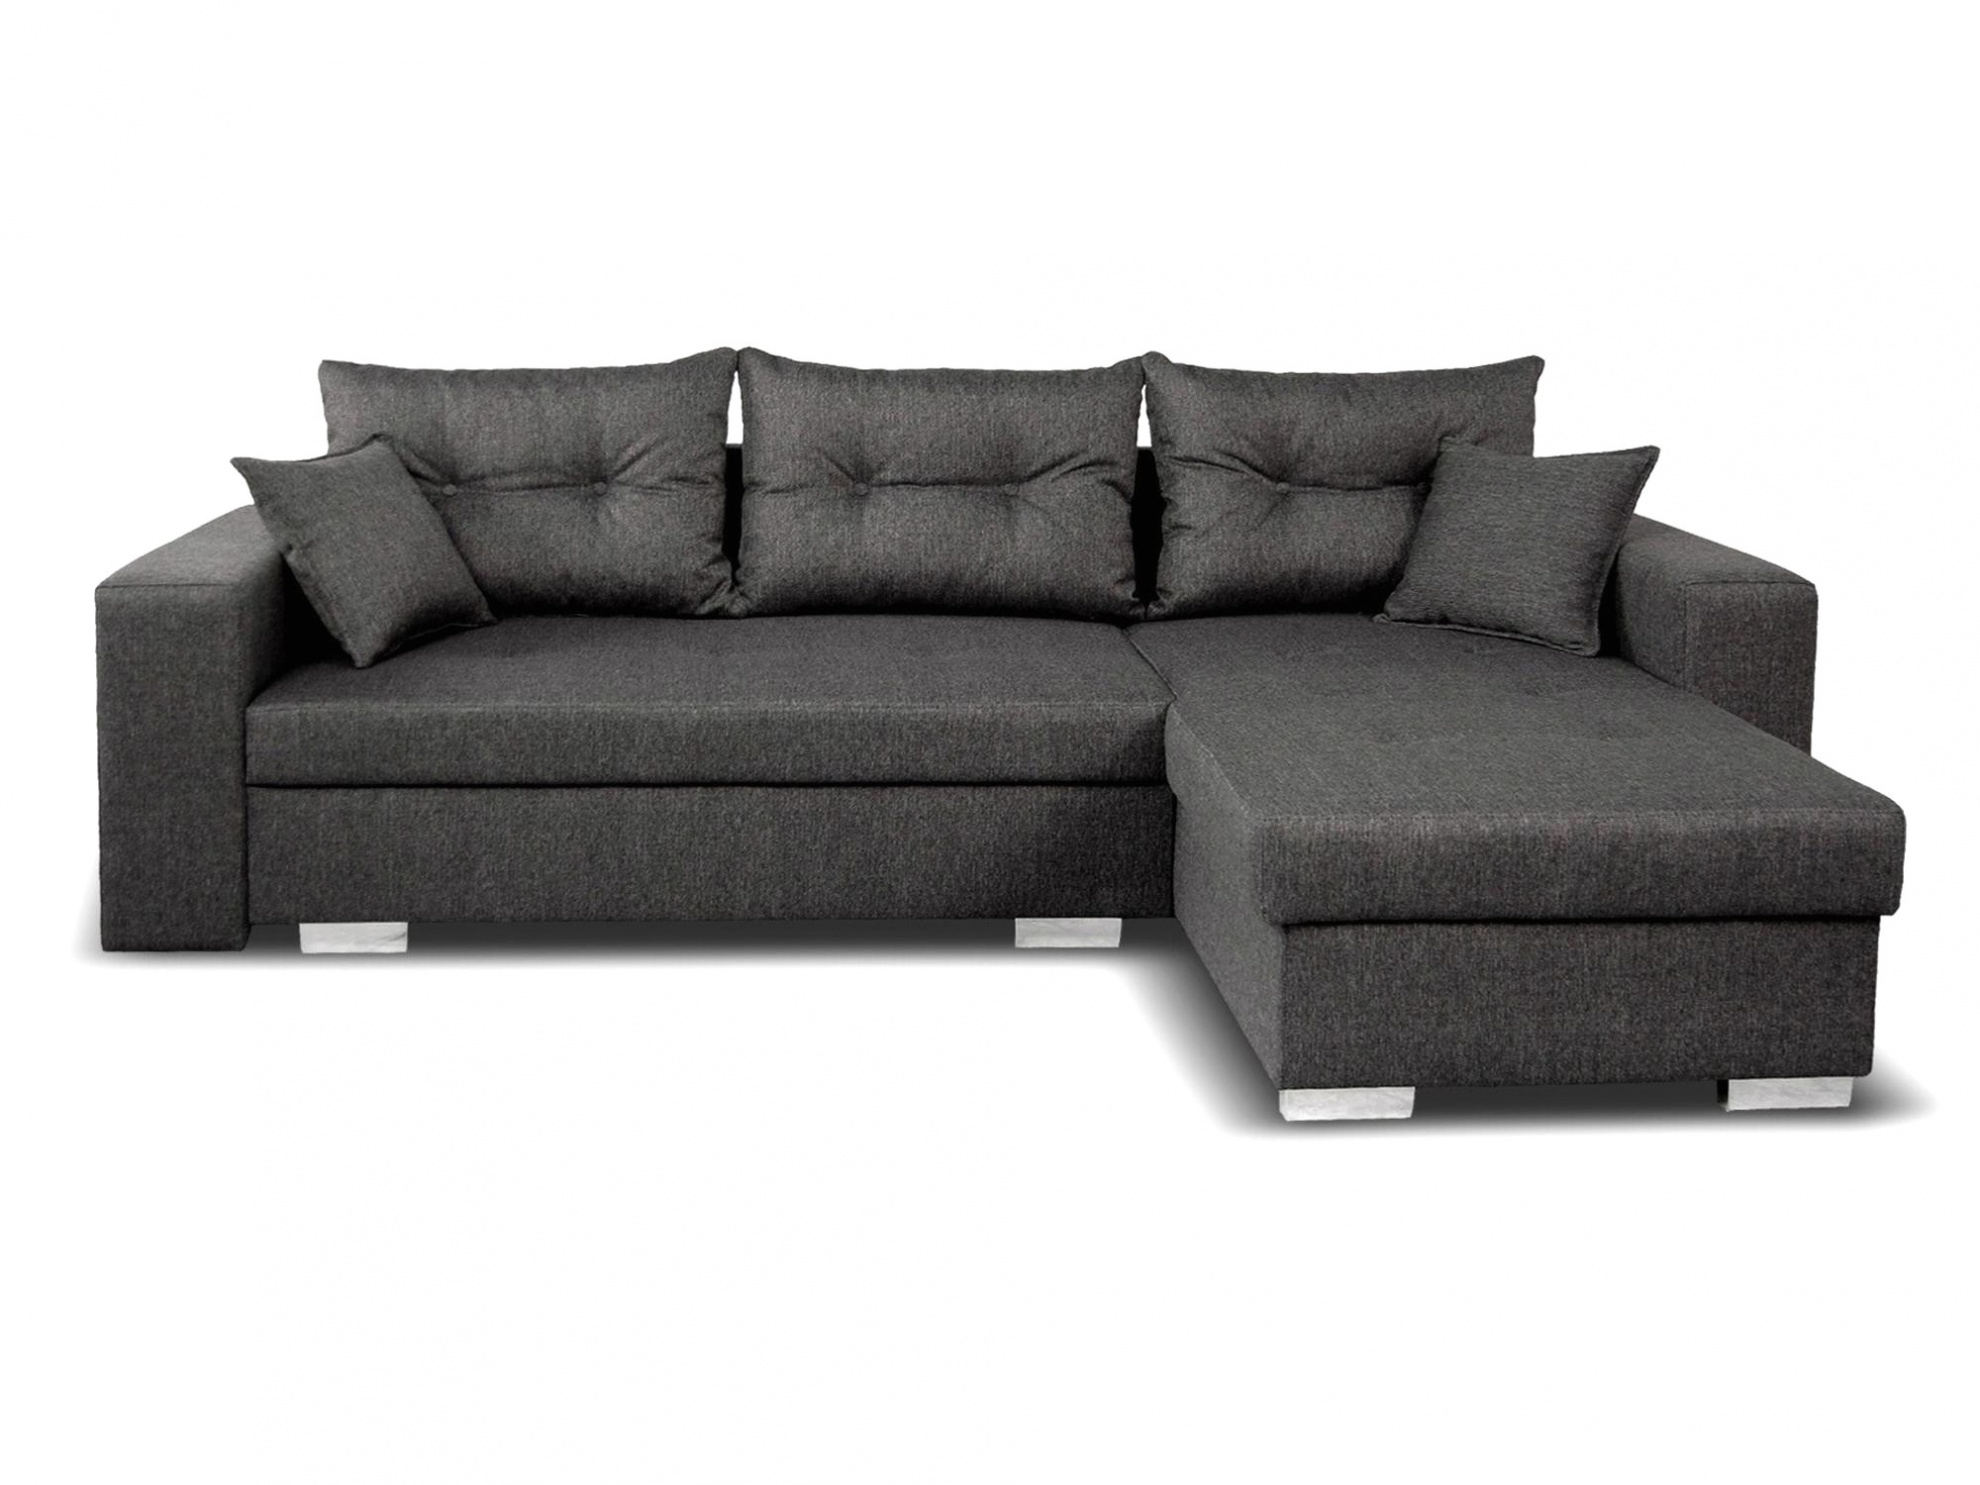 Ikea Canapé Modulable Meilleur De Image Maha S Canapé Convertible Moderne Thuis Mahagranda